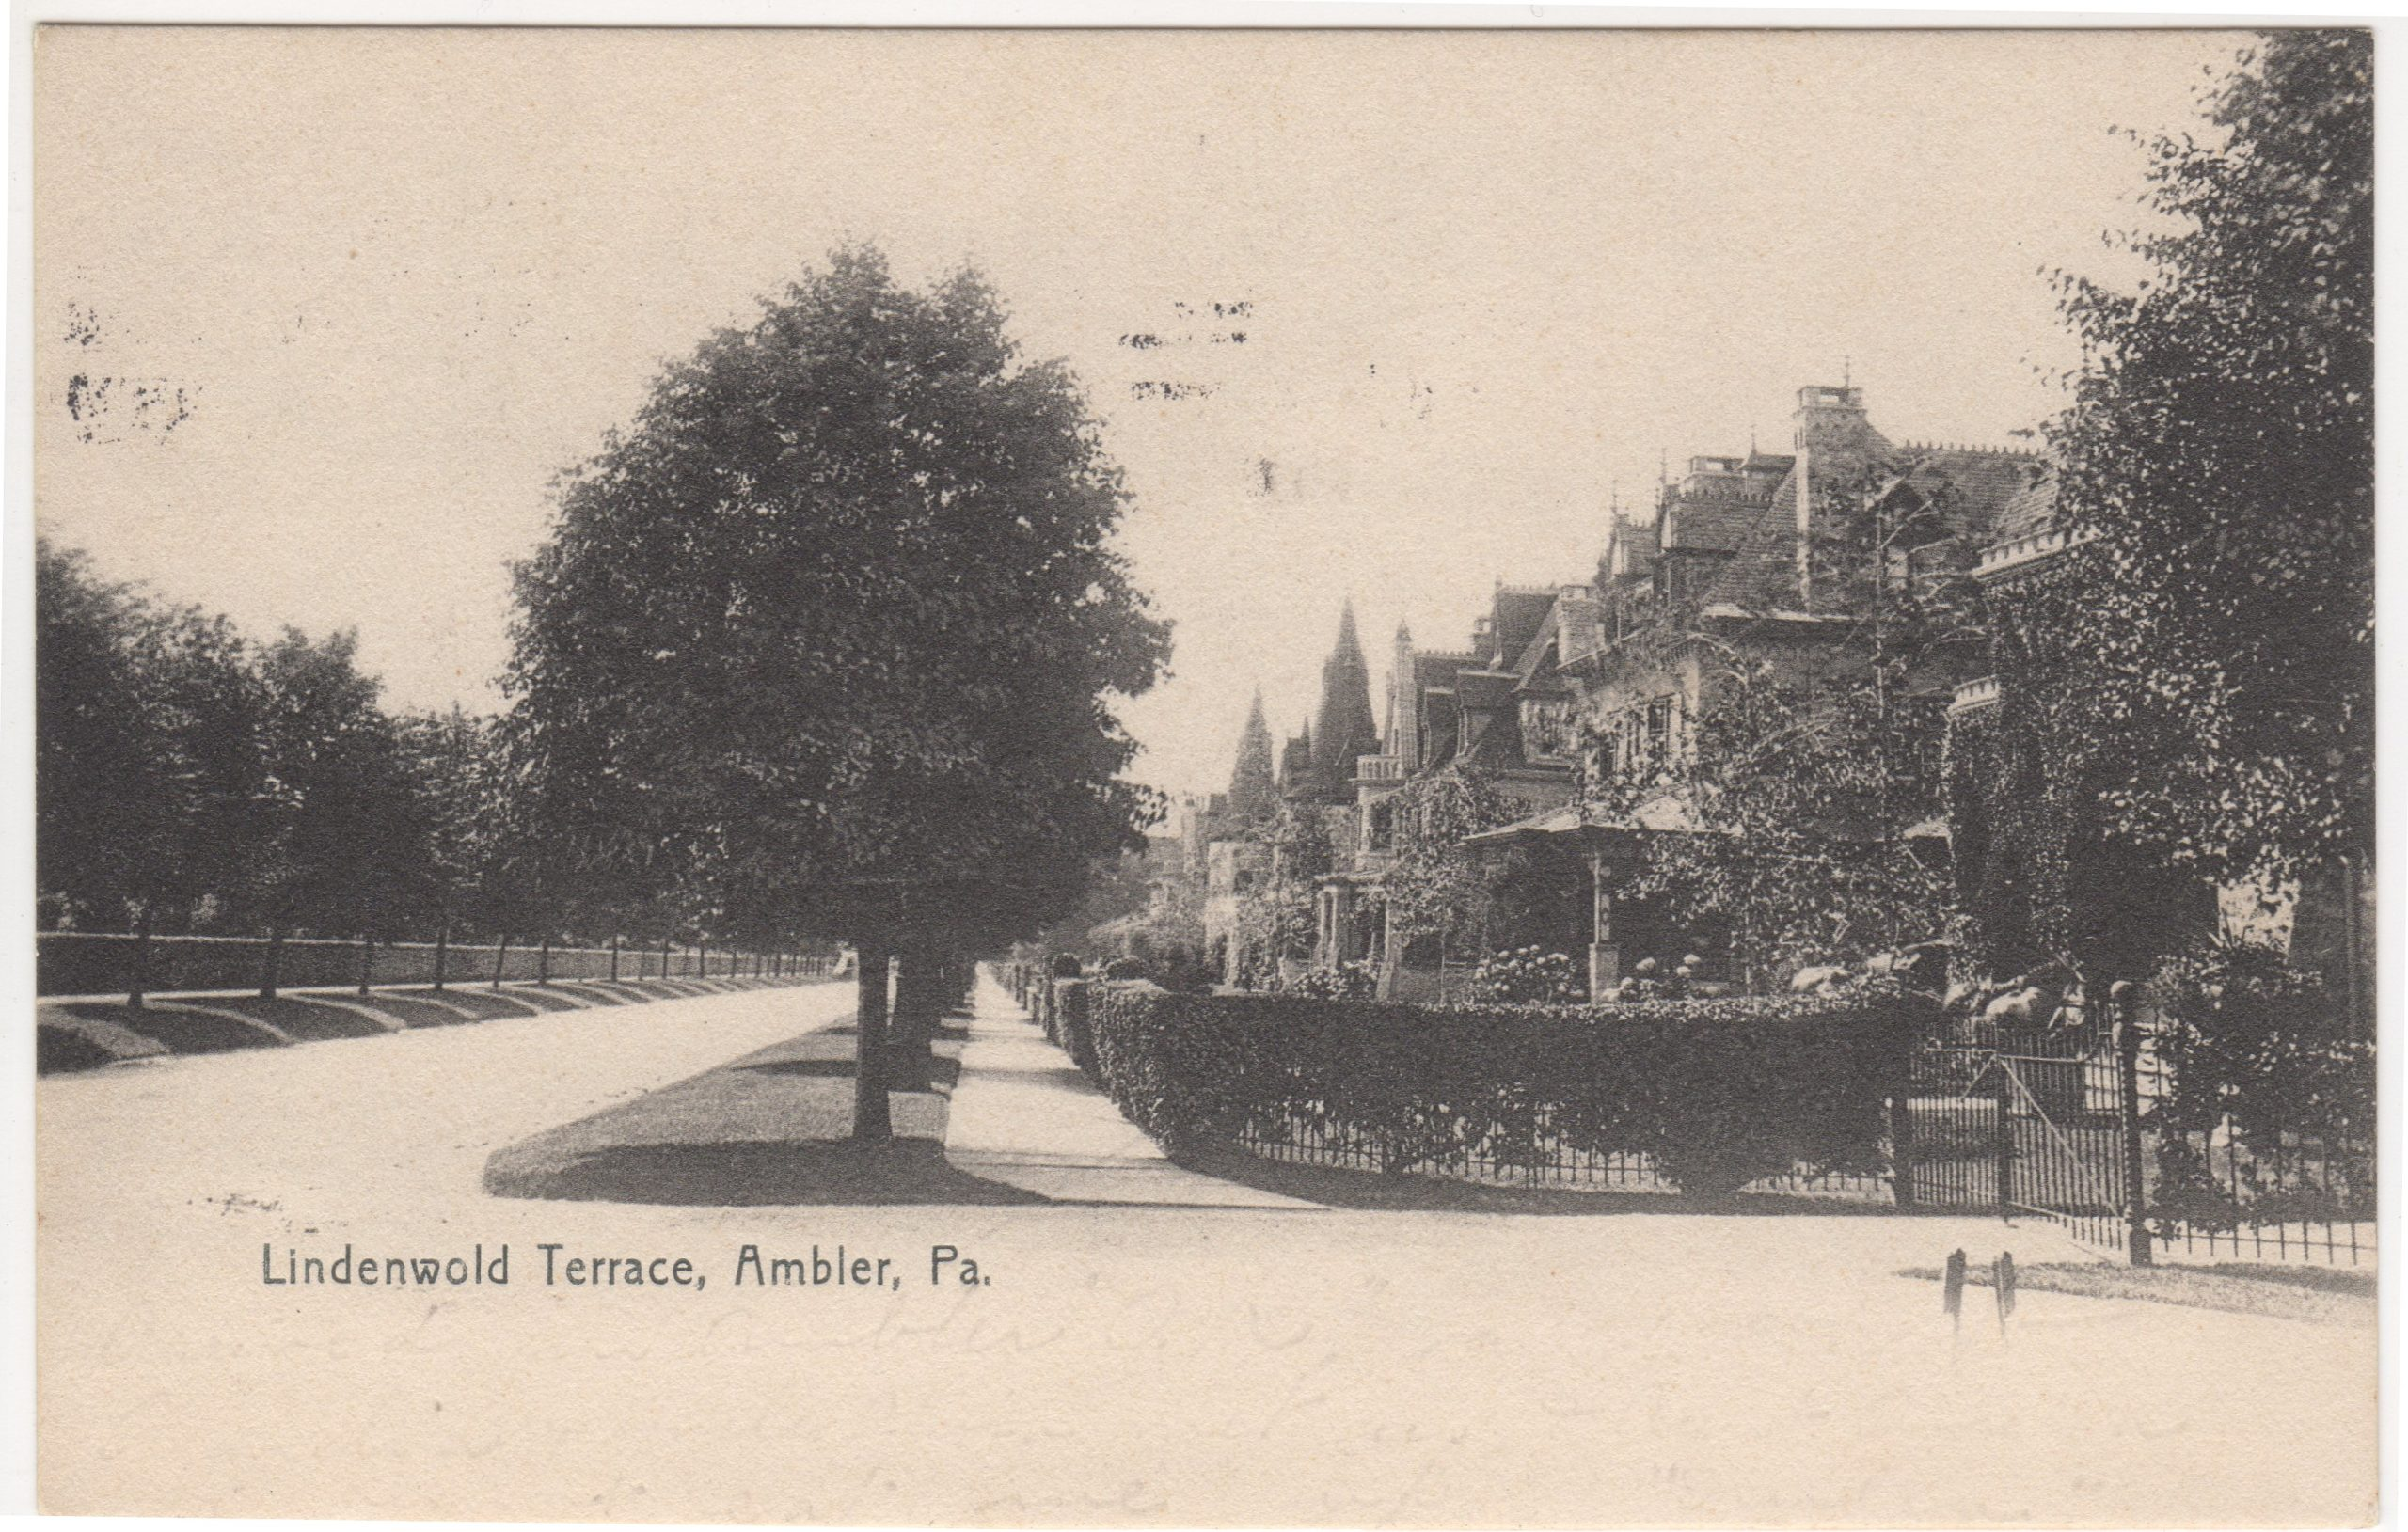 4125.90 Ambler Pa Postcard_Lindenwold Terrace_circa 1907